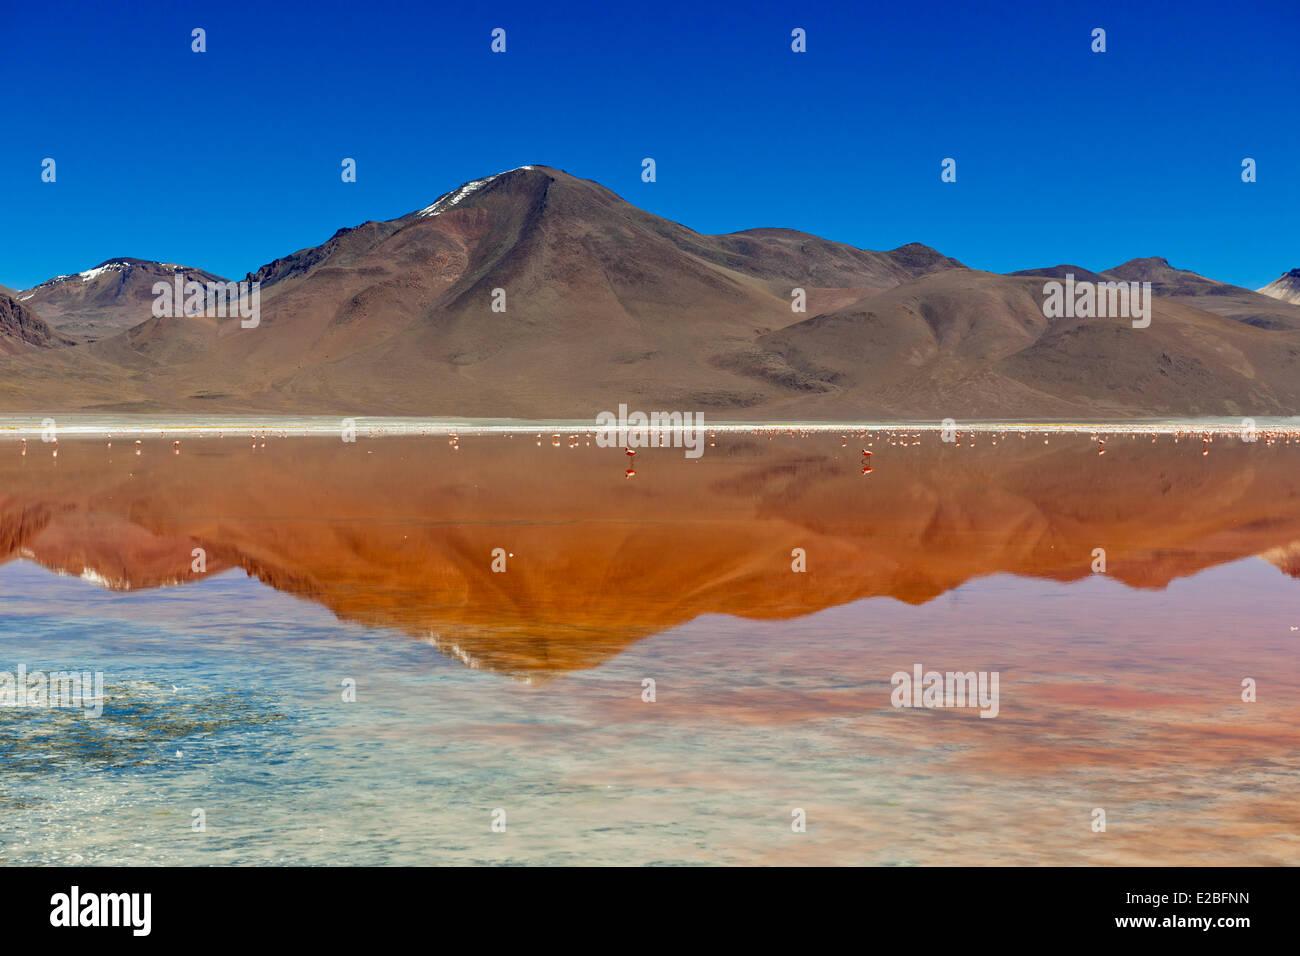 Bolivia, Potosi Department, Sur Lipez Province, Eduardo Avaroa Andean Fauna National Reserve, colony of flamingoes - Stock Image